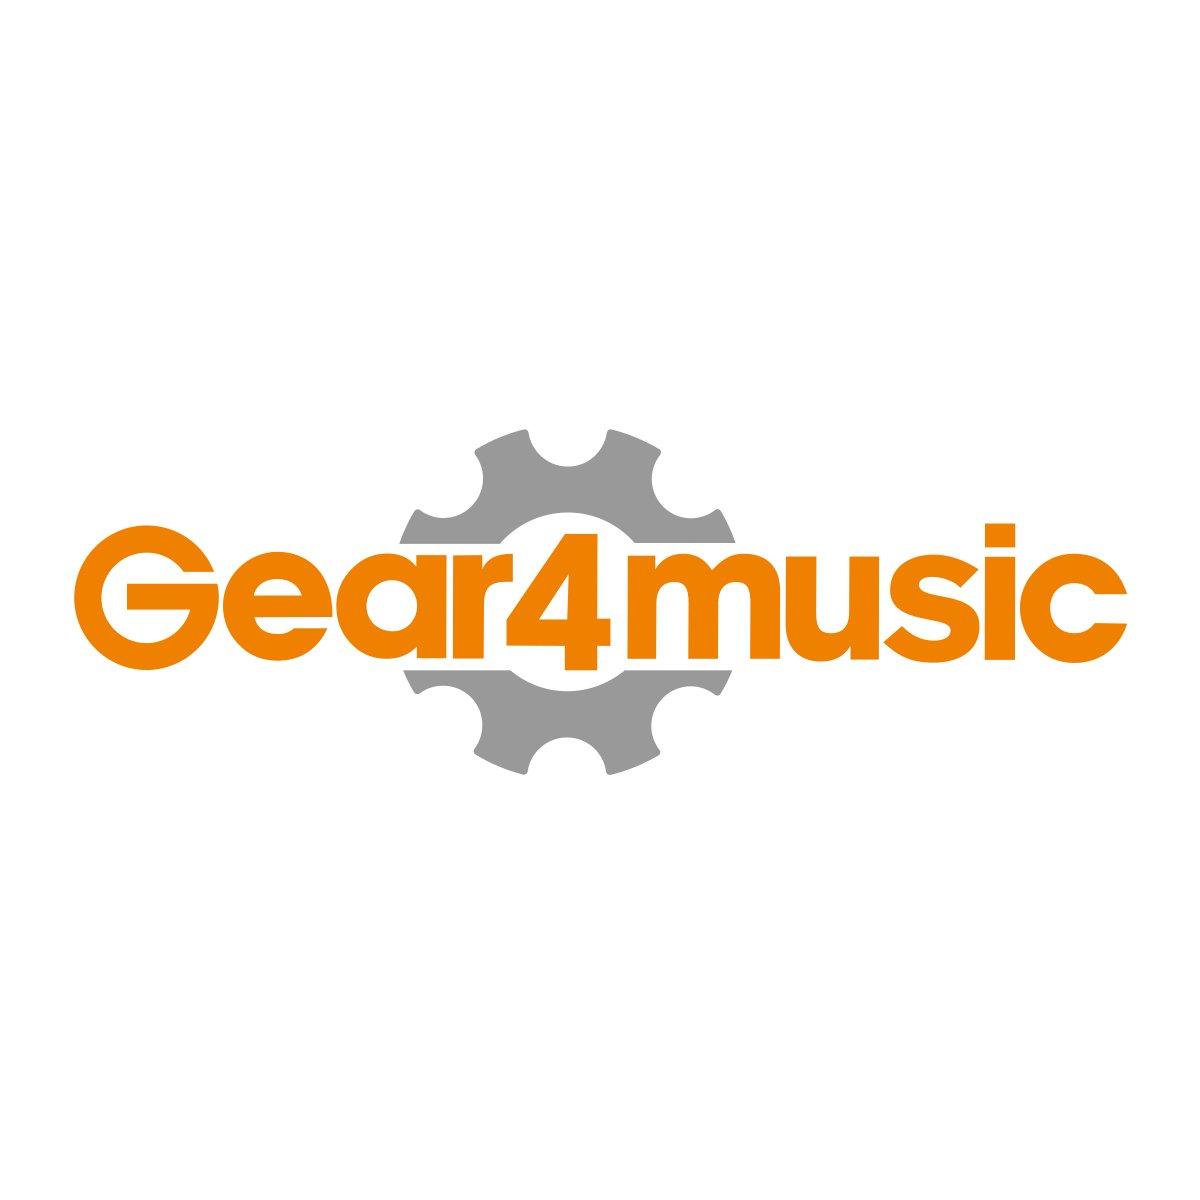 Money Wallpaper Hd Student 4 4 Violin Pink By Gear4music At Gear4music Com